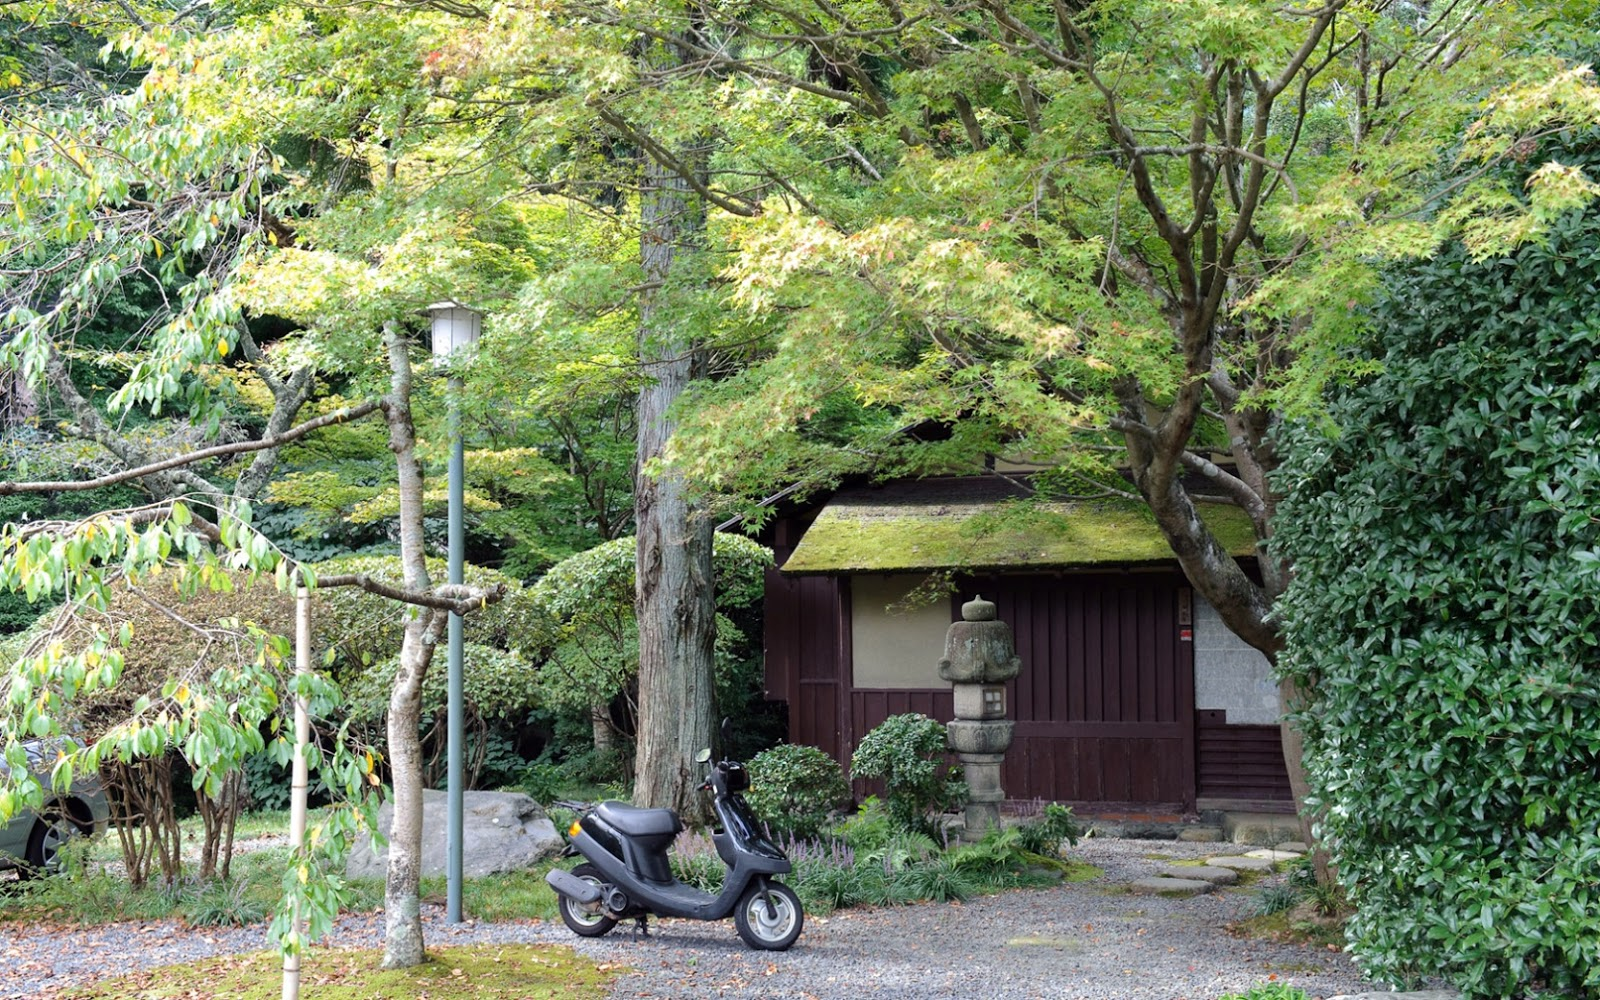 http://4.bp.blogspot.com/-UI2M-E0uaZM/TognhJ6-3WI/AAAAAAAAAaw/QWxEXedQ330/s1600/Japan+%2528115%2529.jpg